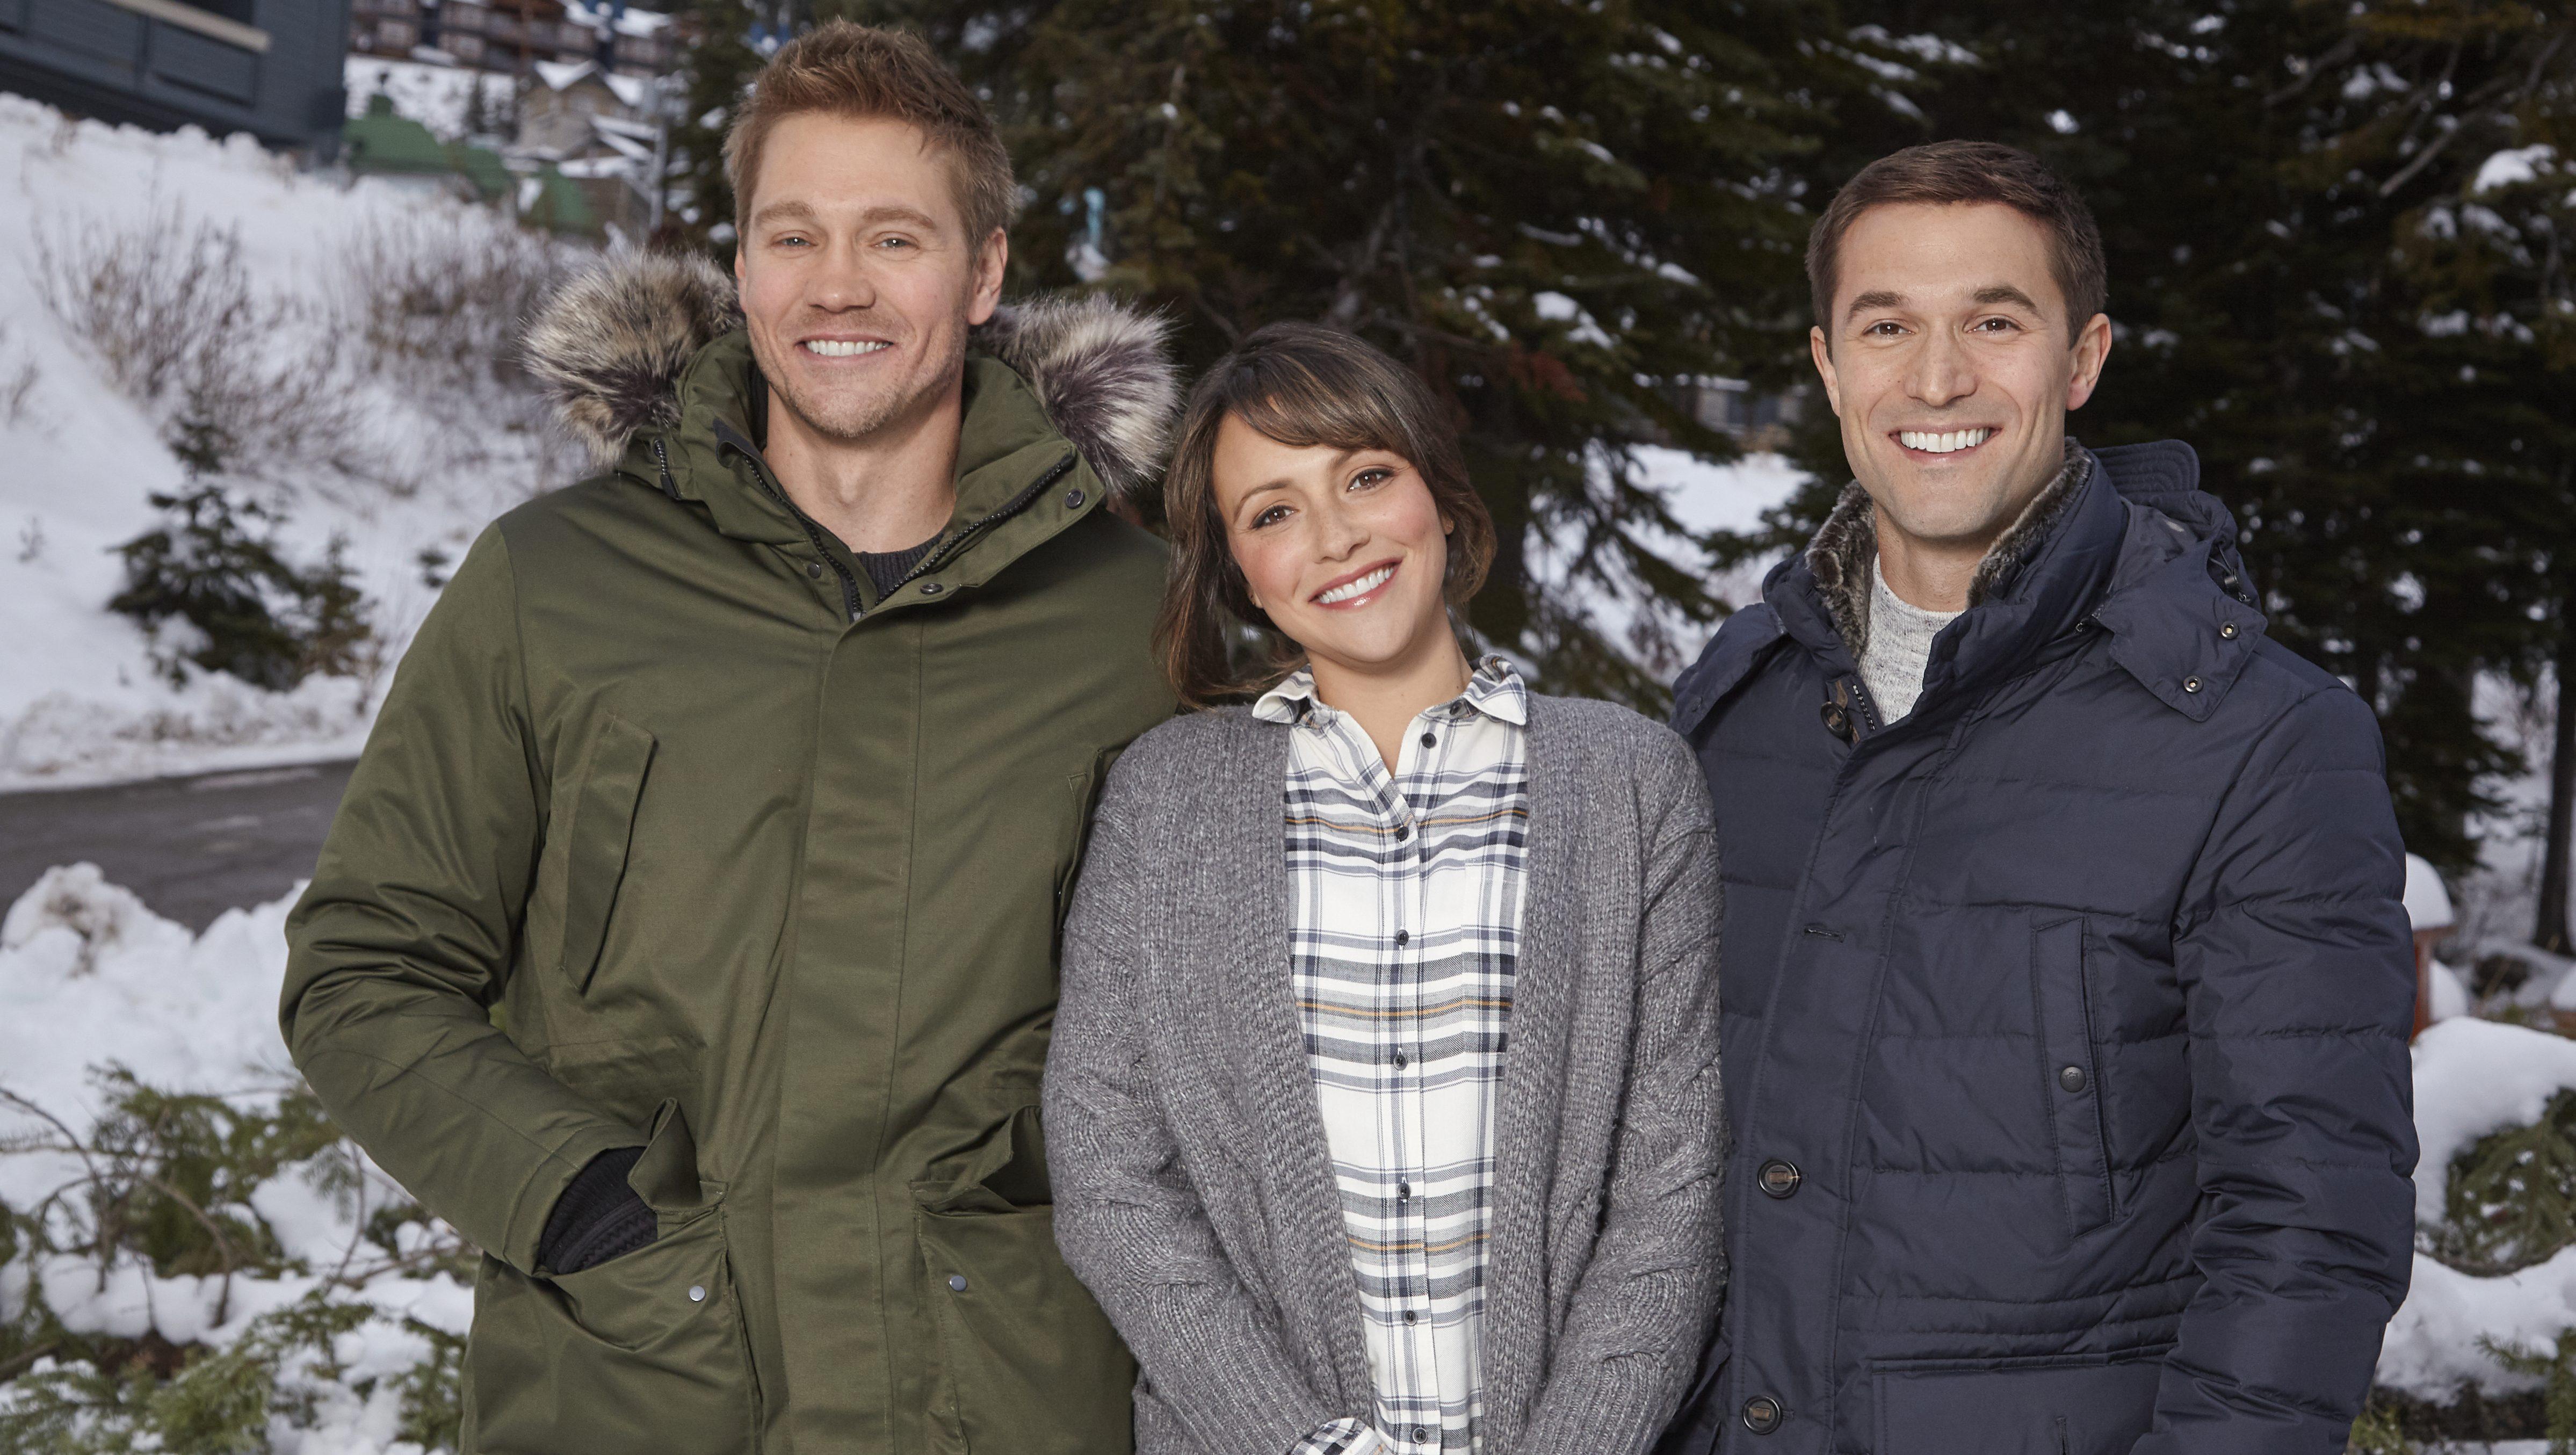 Christmas Wonderland 2020 Cast Hallmark's Love in Winterland: Where Filmed, Cast & Photos | Heavy.com